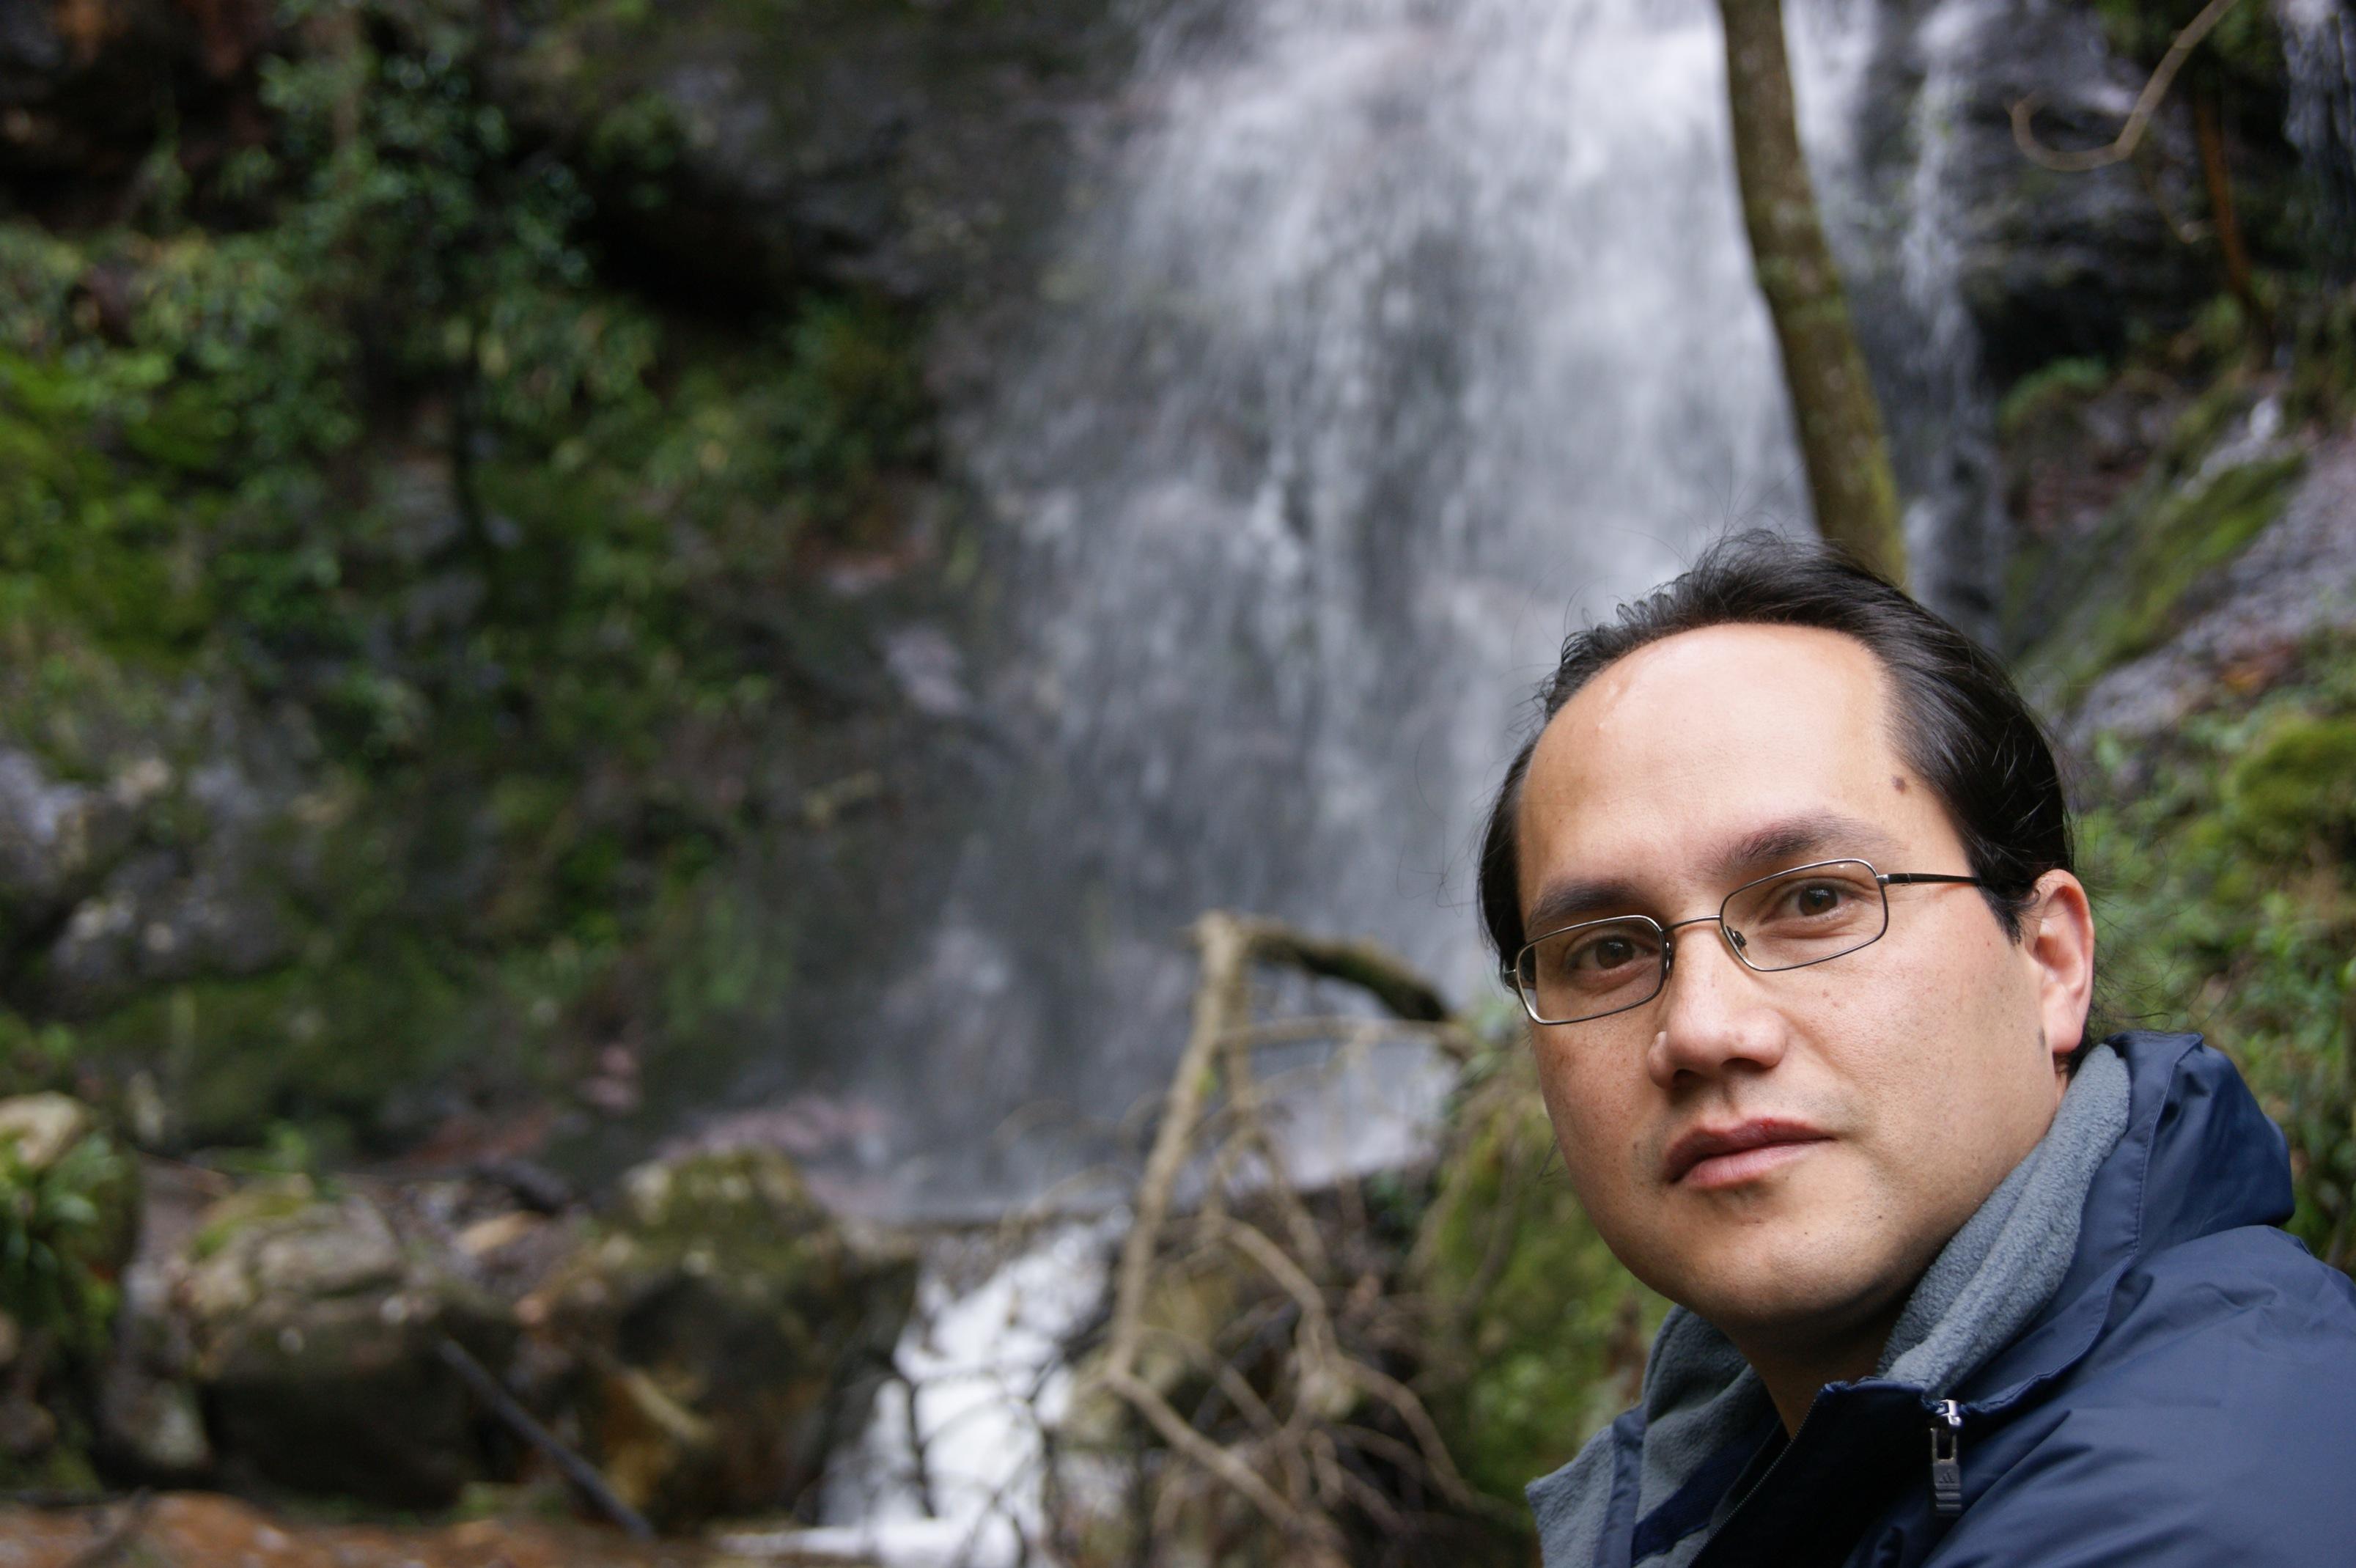 Diego Mauricio Riano Pachon